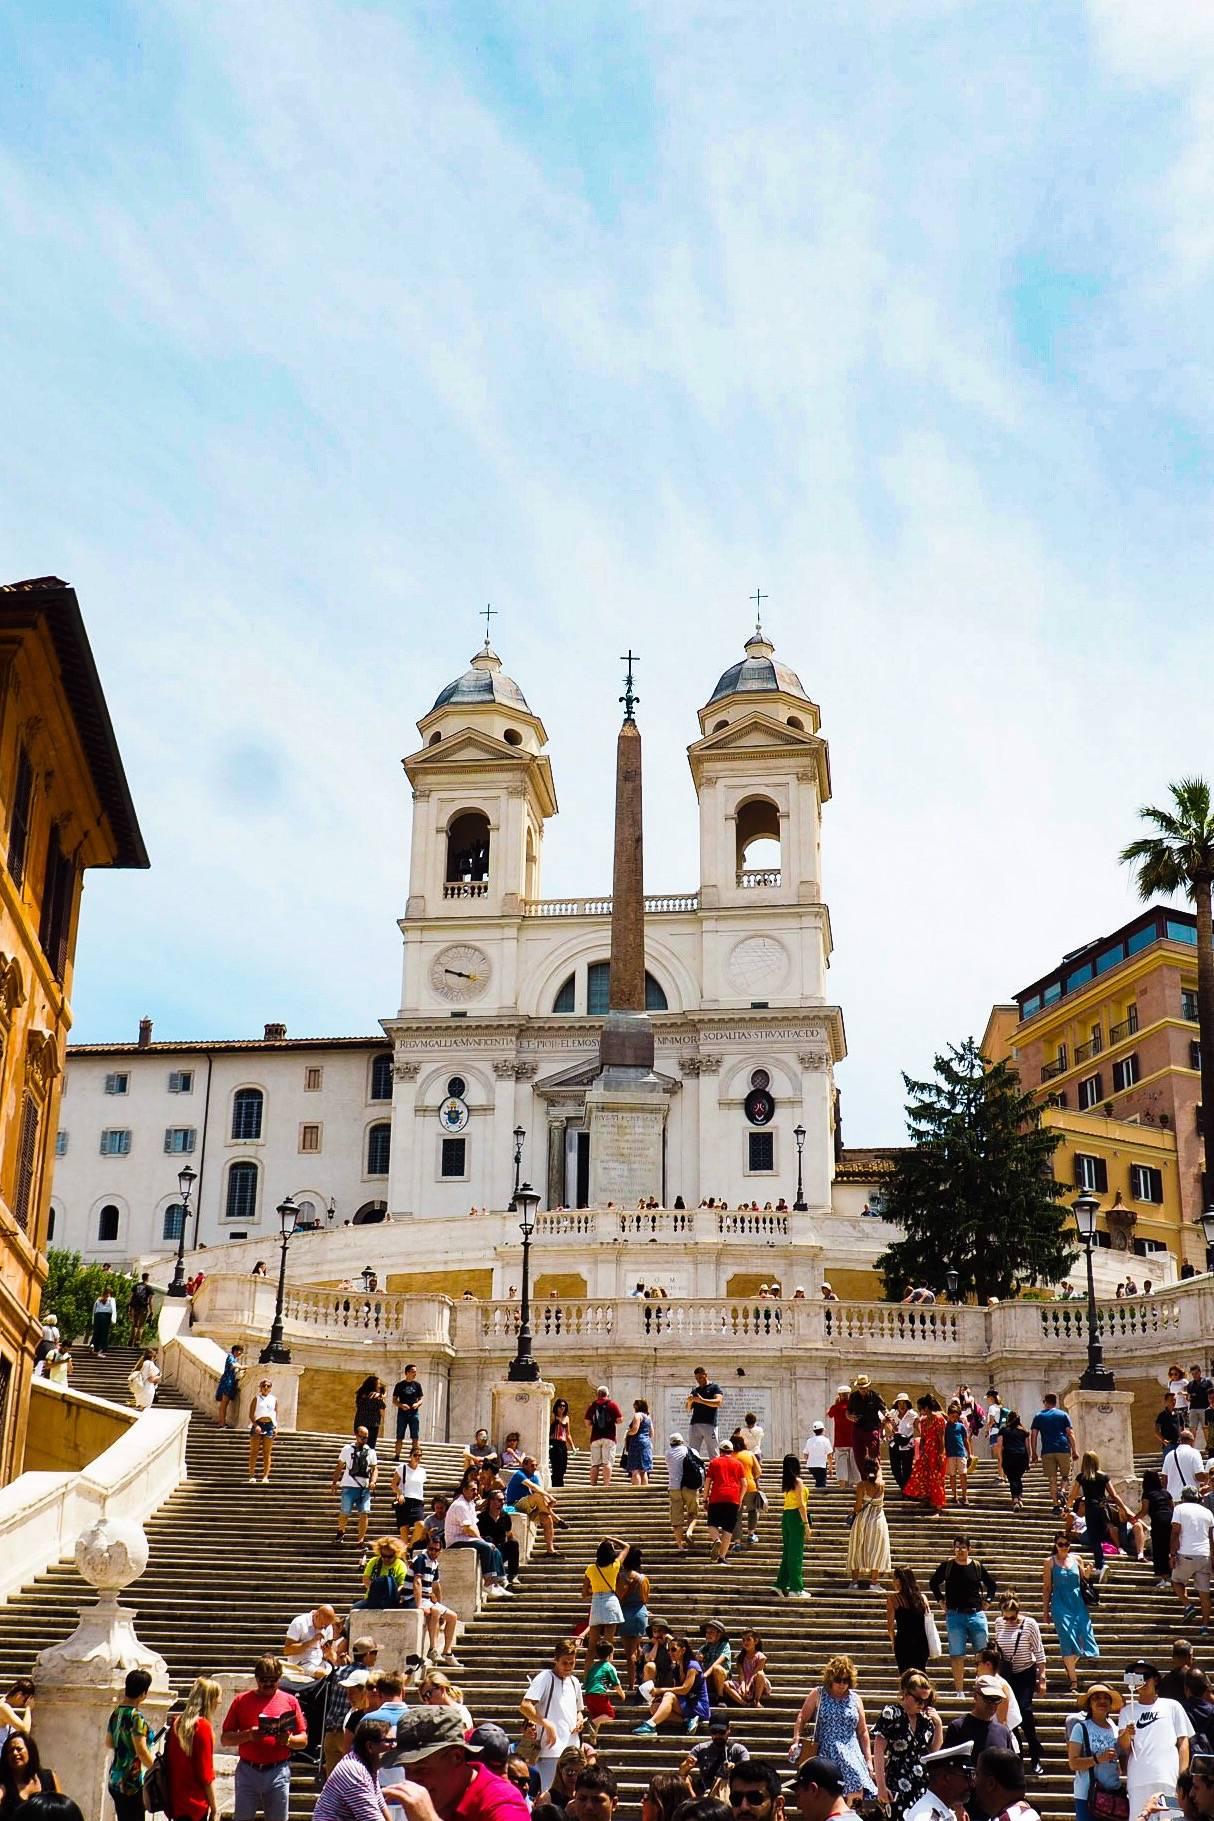 Rome_City_Guide_spanish_steps